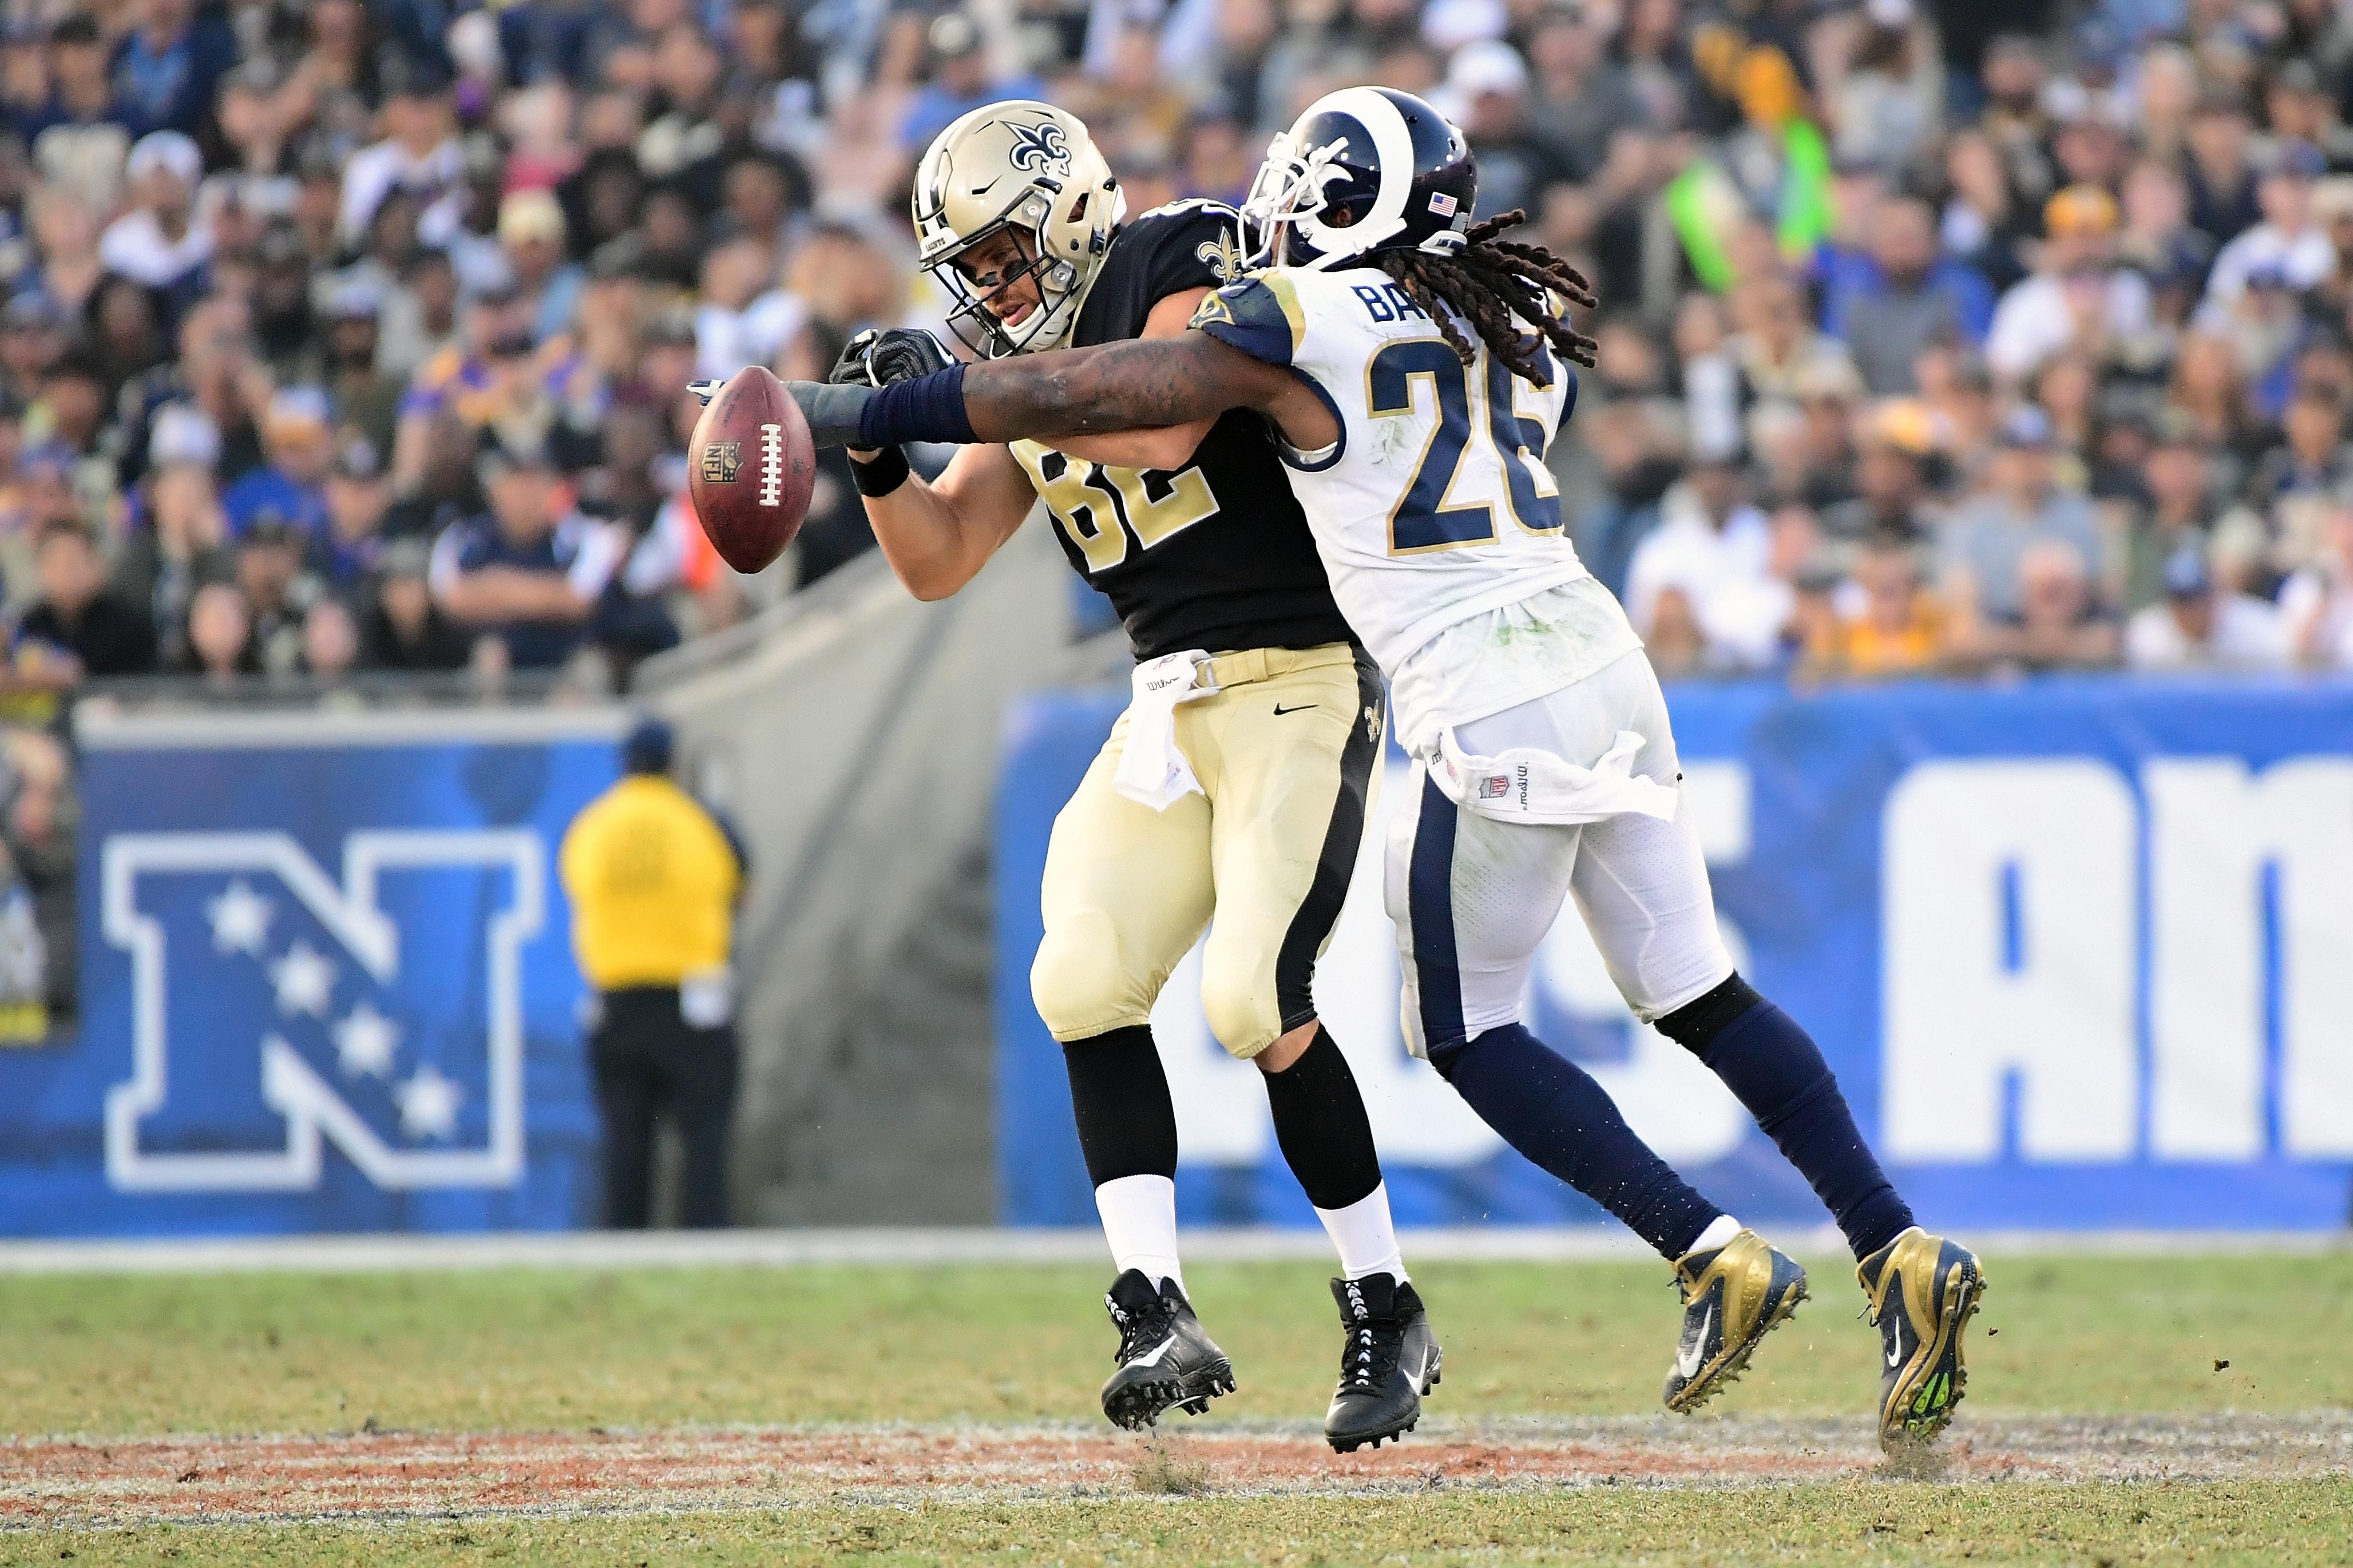 Los Angeles Rams ILB Mark Barron breaks up a pass to New Orleans Saints TE Coby Fleener in Week 12, November 26, 2017.